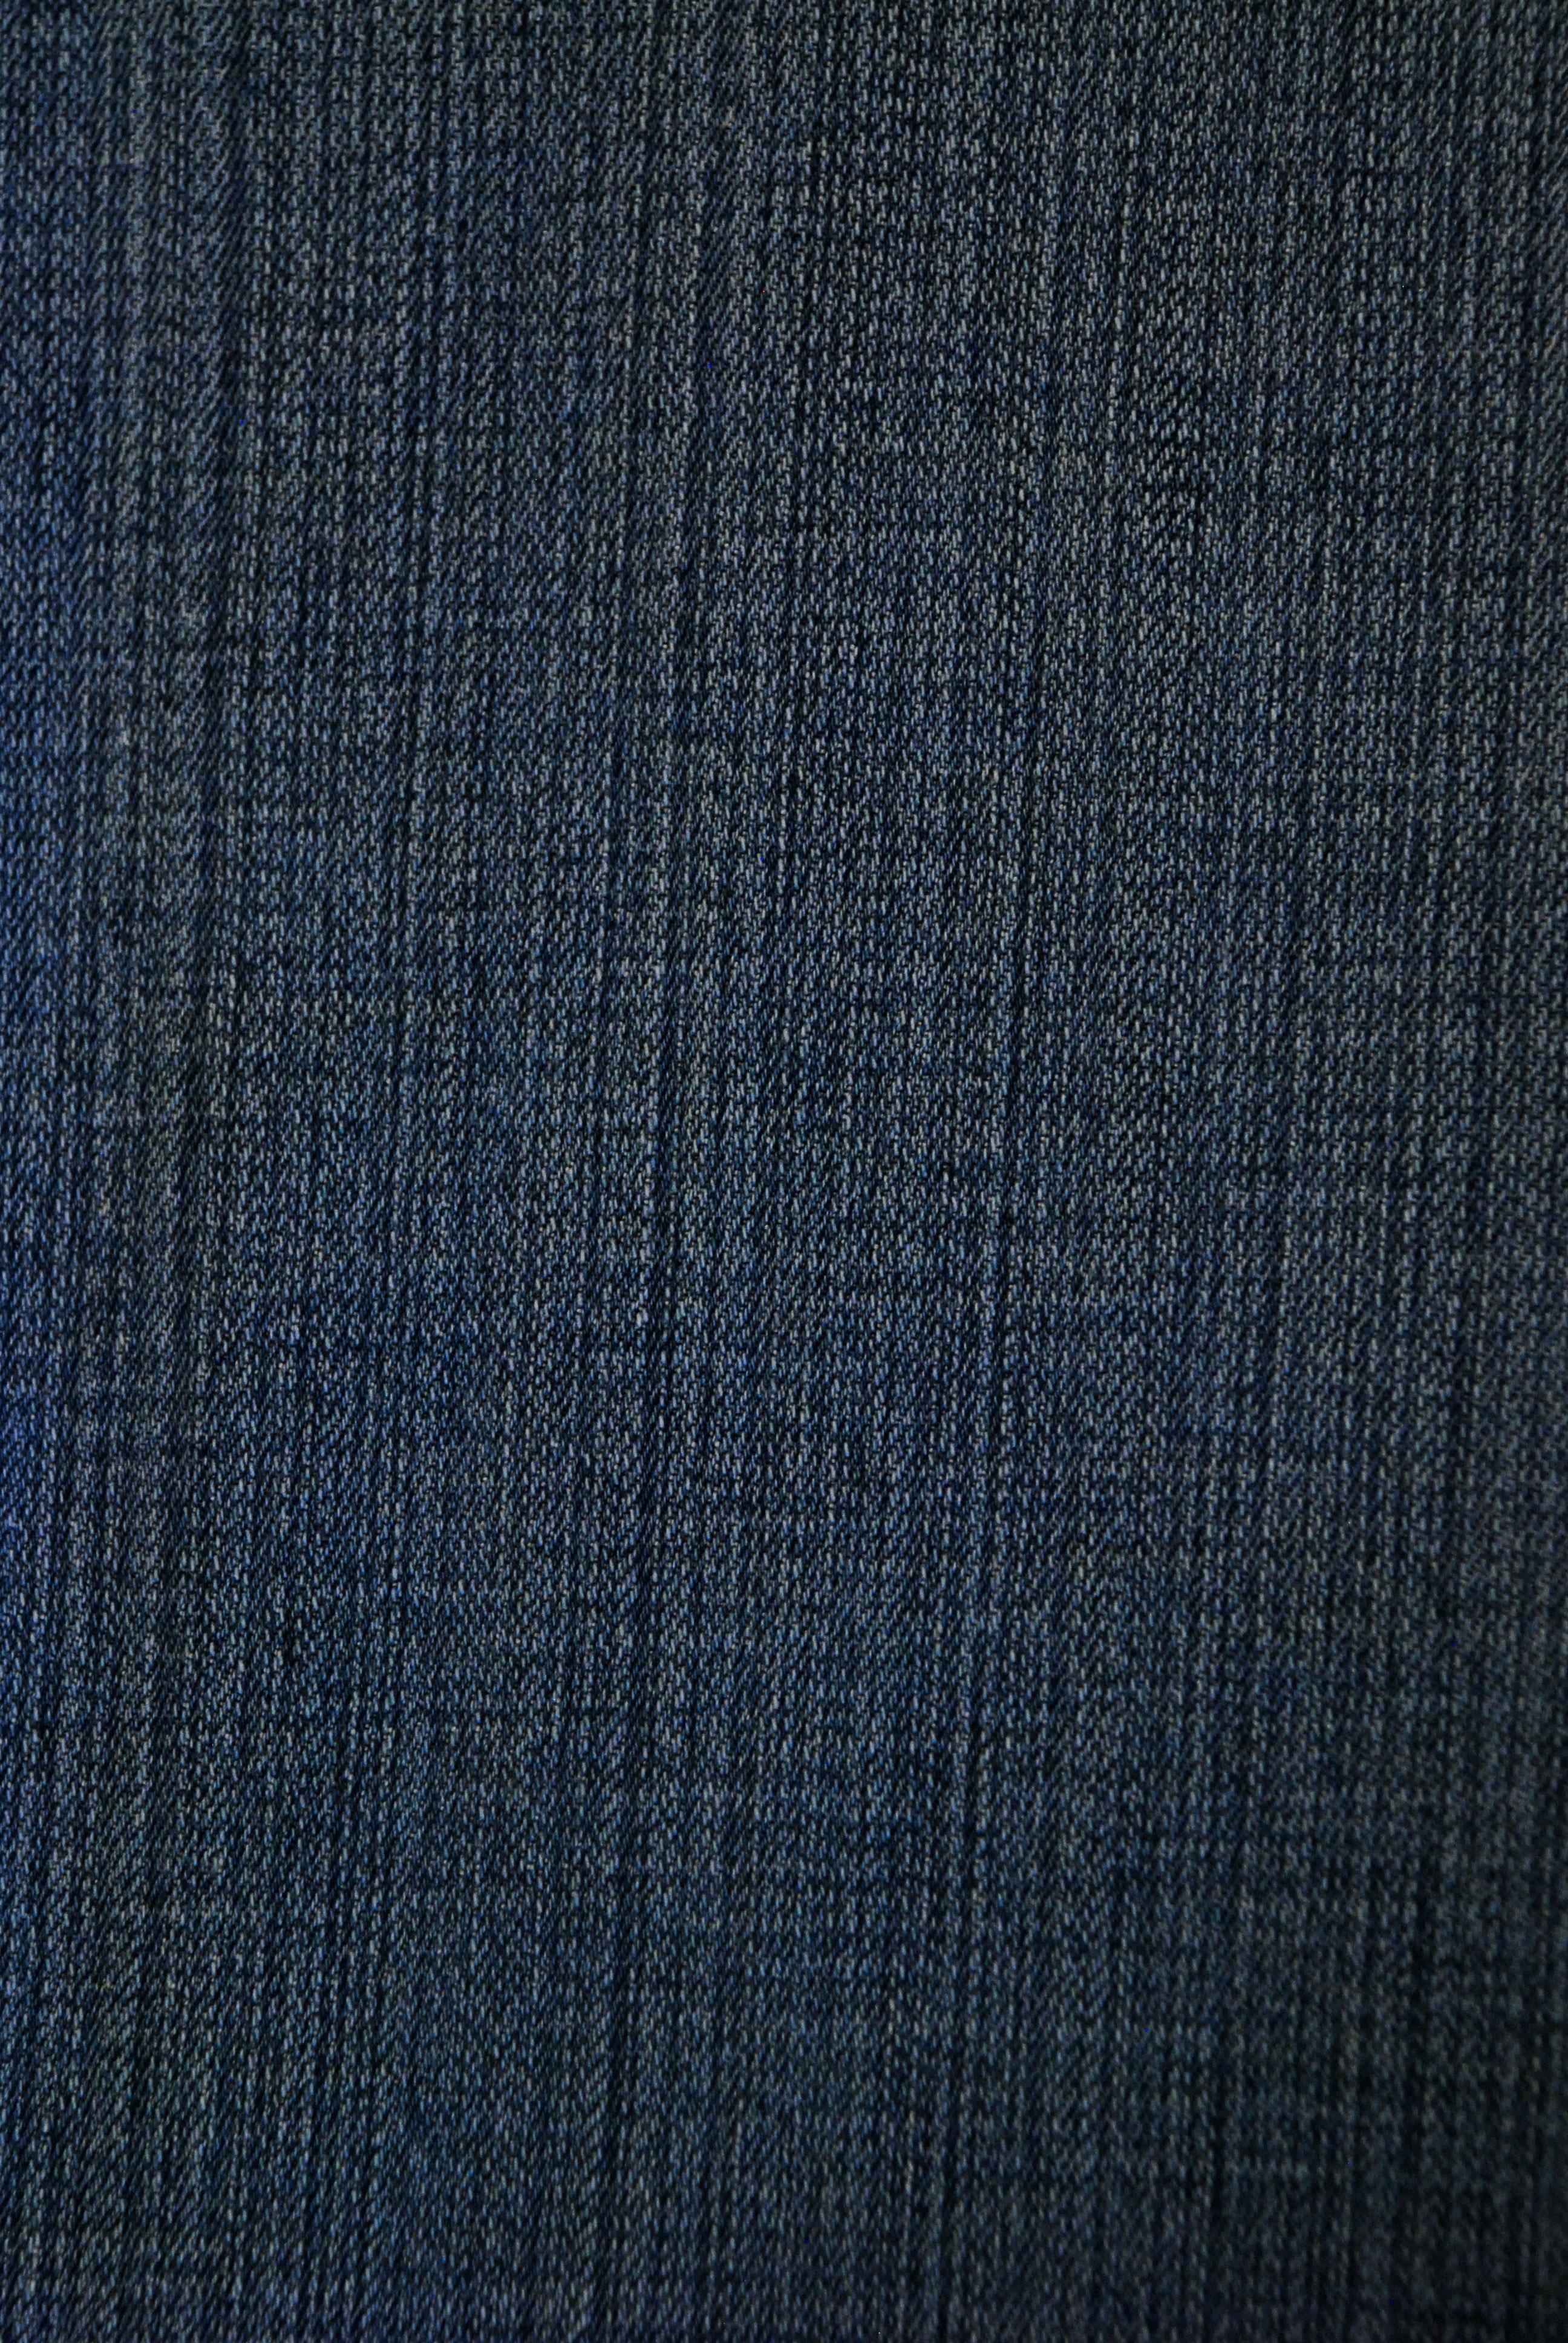 HD Denim fabric texture download (jeans, fabric): www.texturedownload.com/2011/02/5-hd-denim-fabric-texture-download...